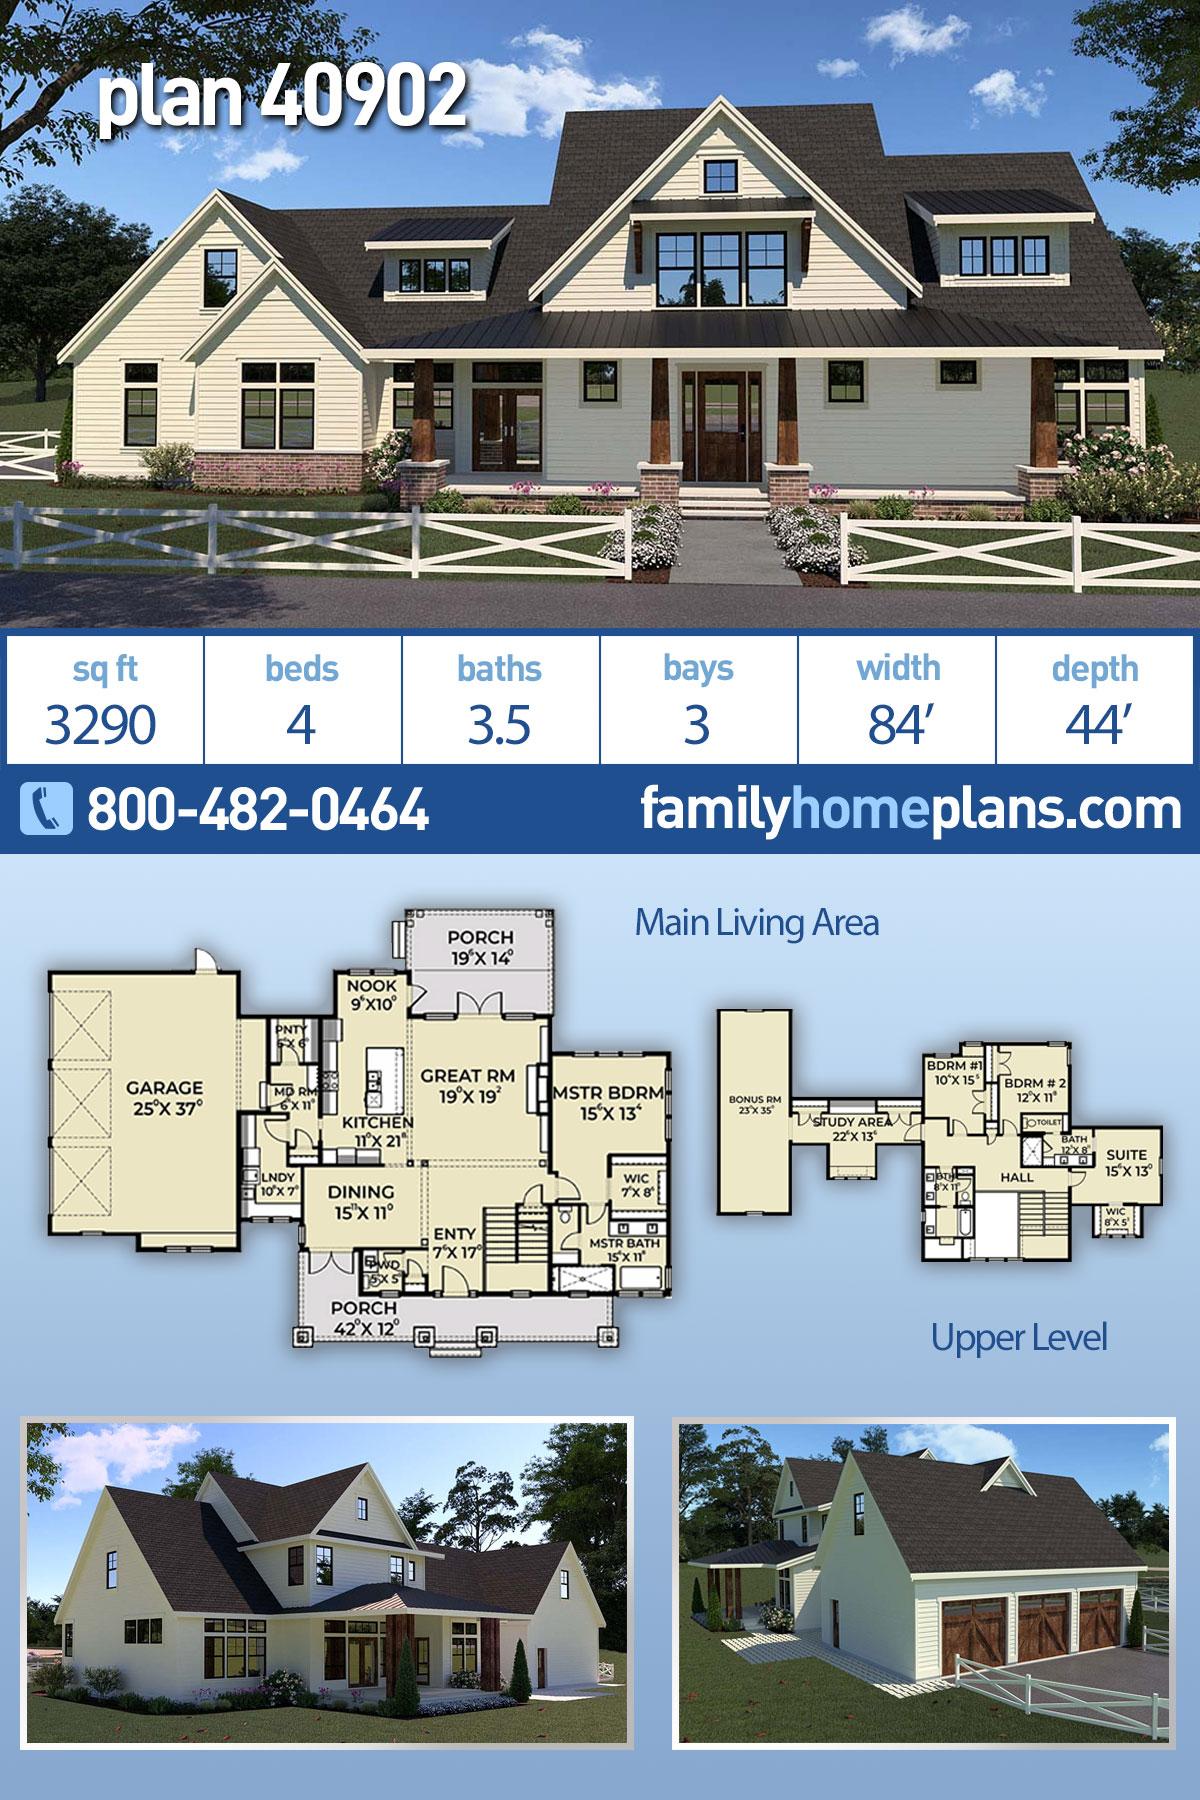 Contemporary, Farmhouse House Plan 40902 with 4 Beds, 4 Baths, 3 Car Garage